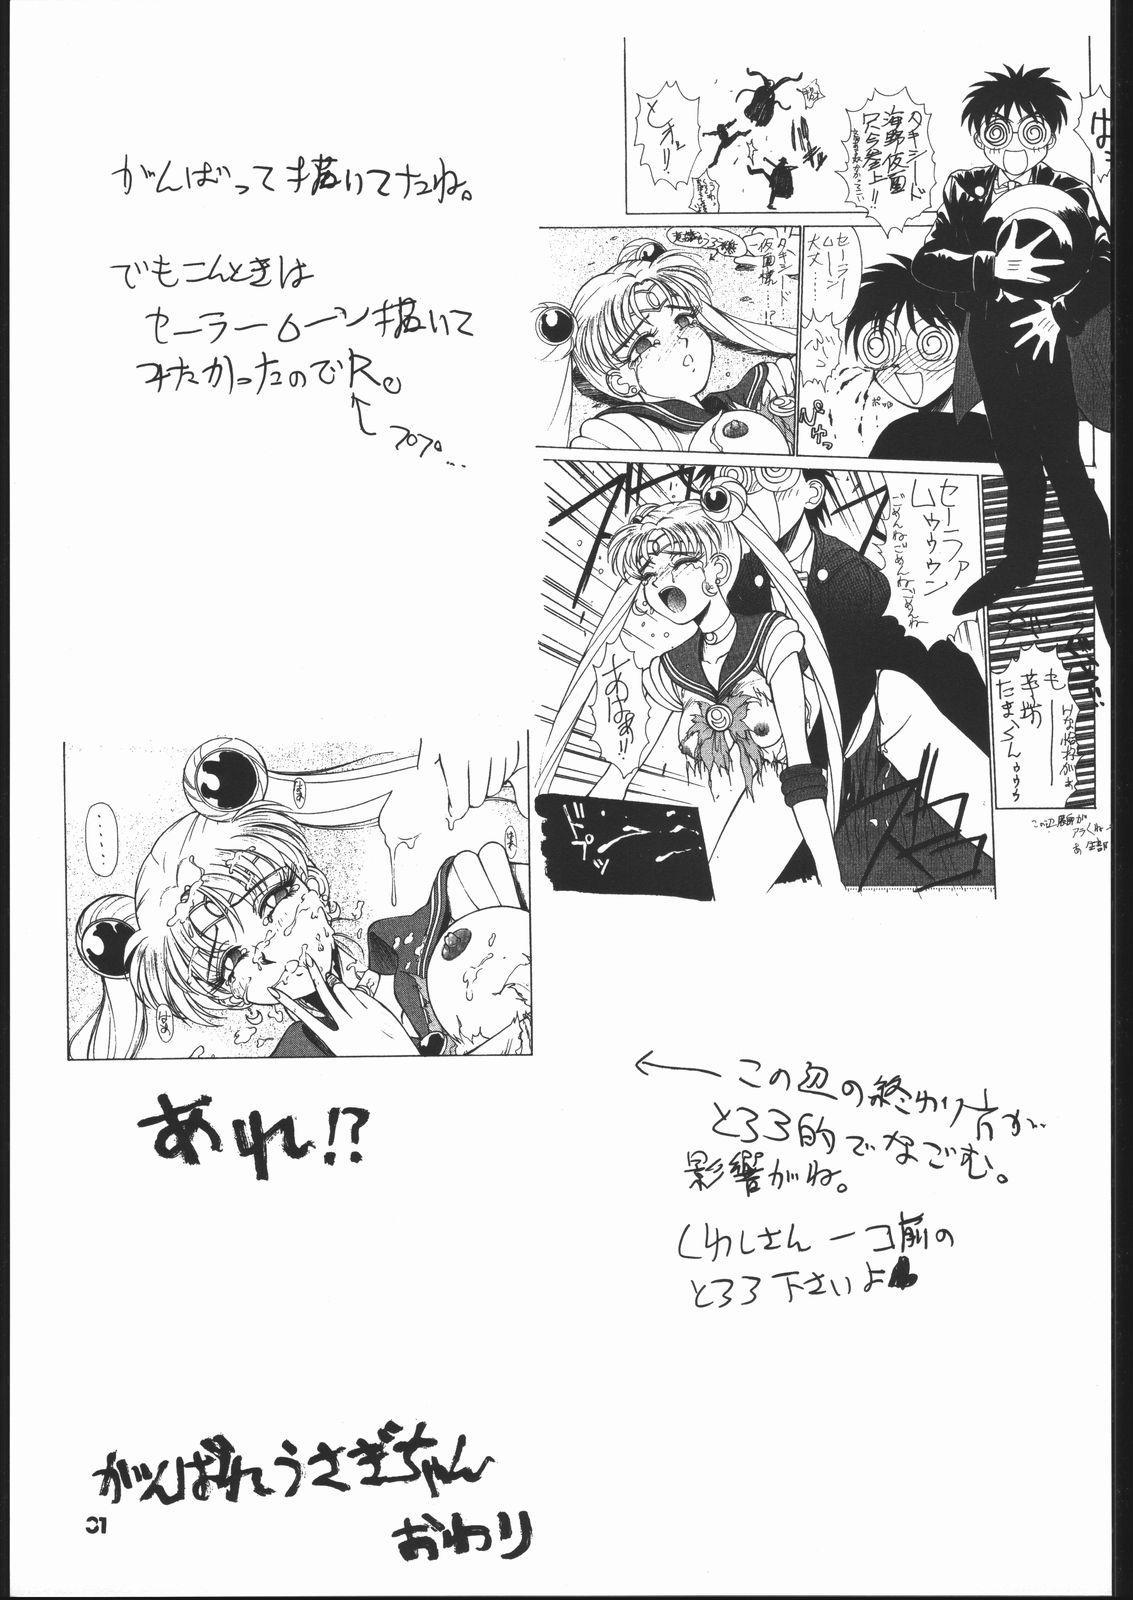 kakutou geemu hon 31